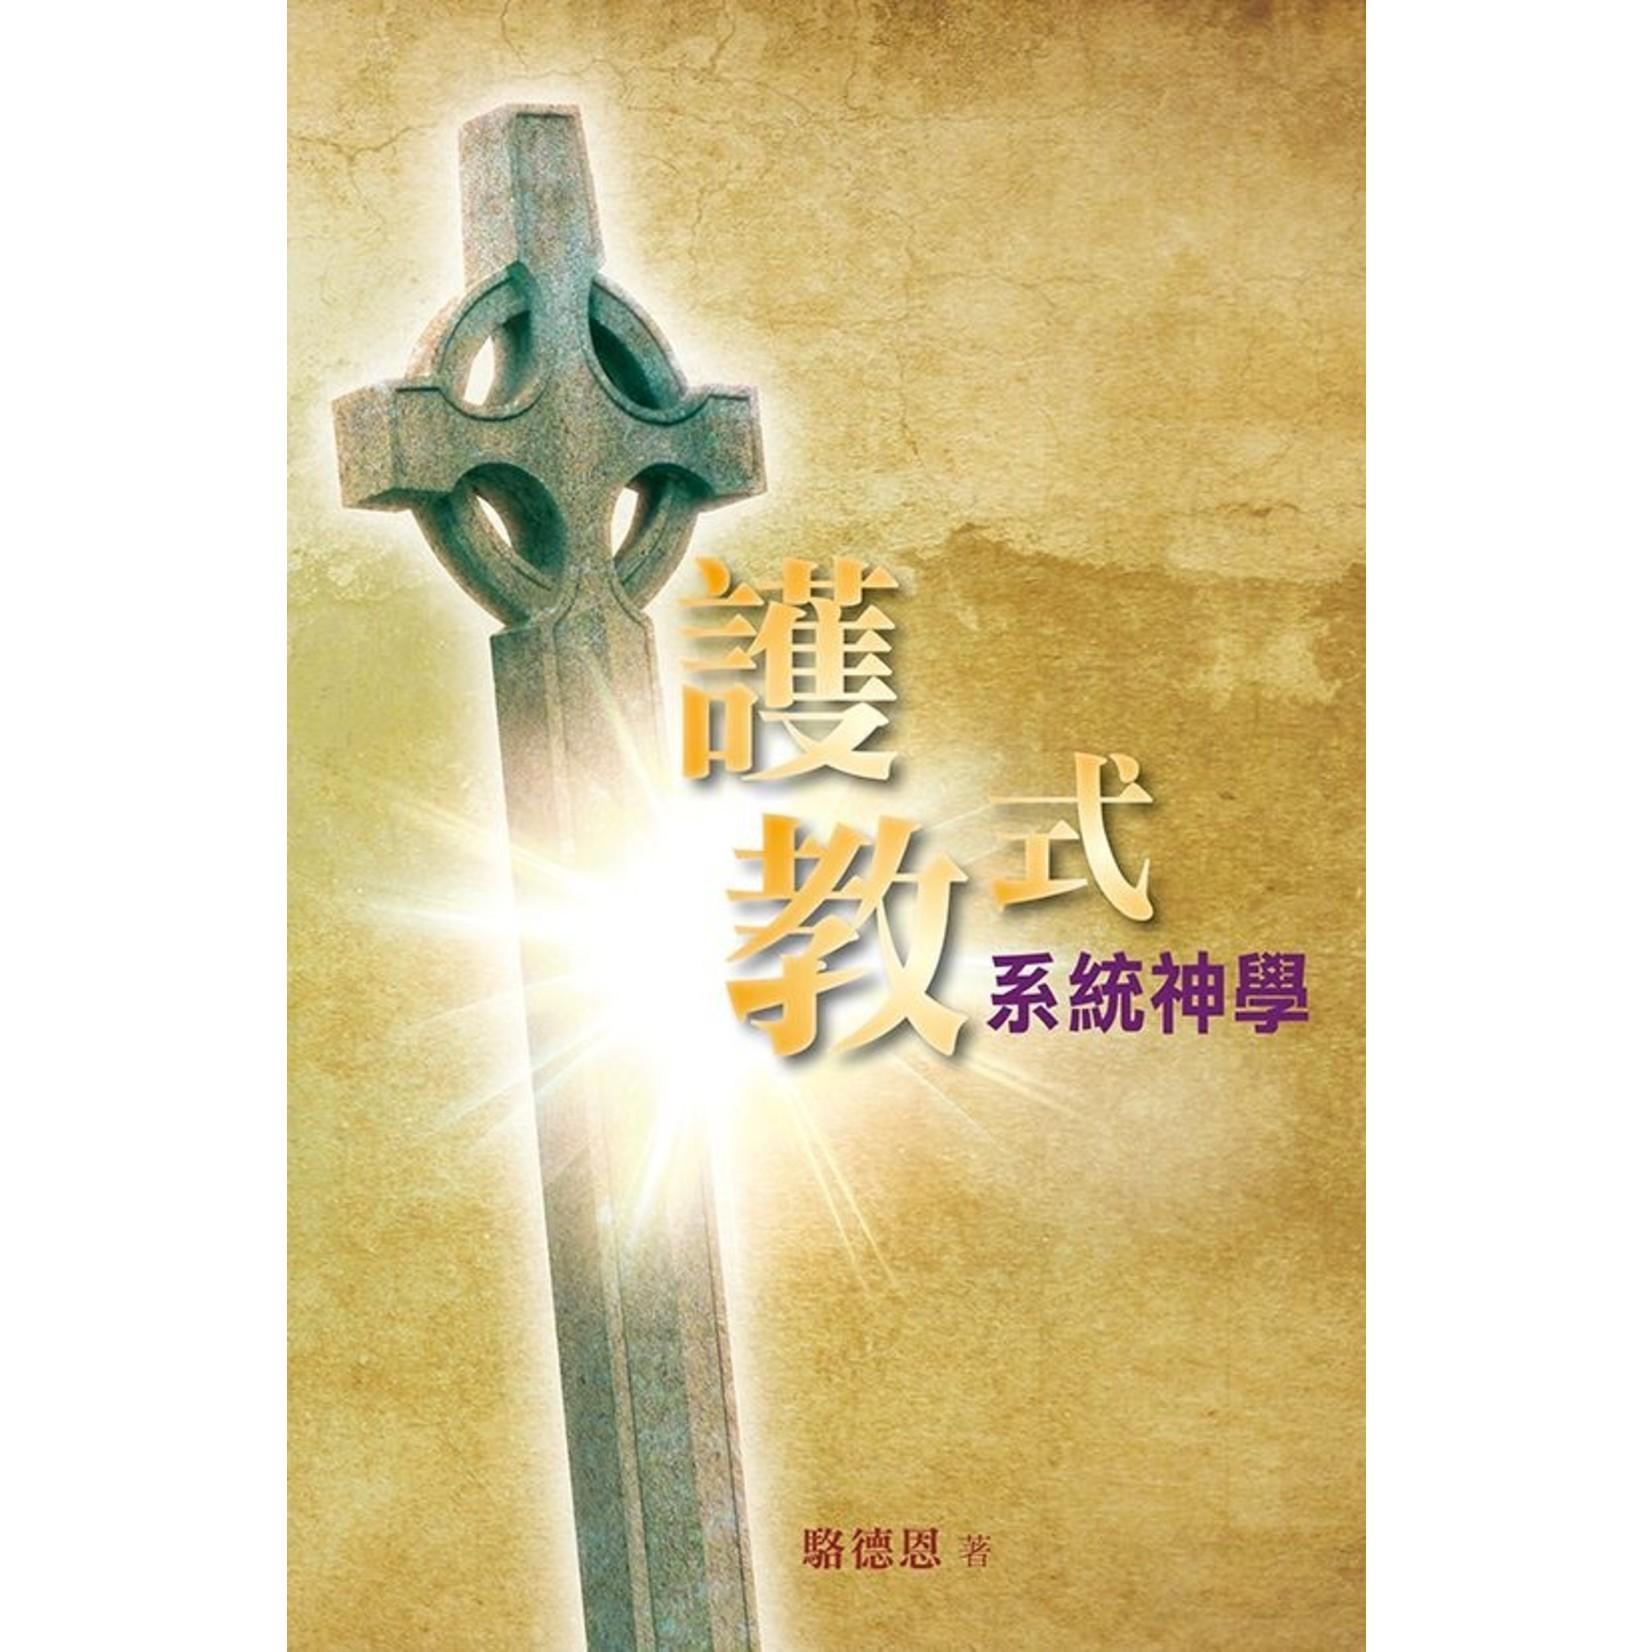 天道書樓 Tien Dao Publishing House 護教式系統神學